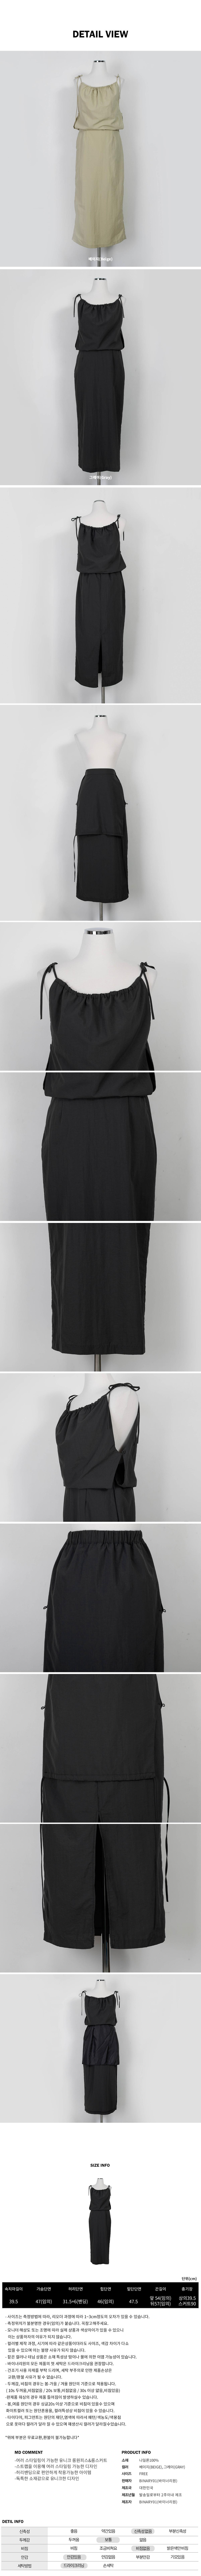 Two-way roaming long Dress& long skirt